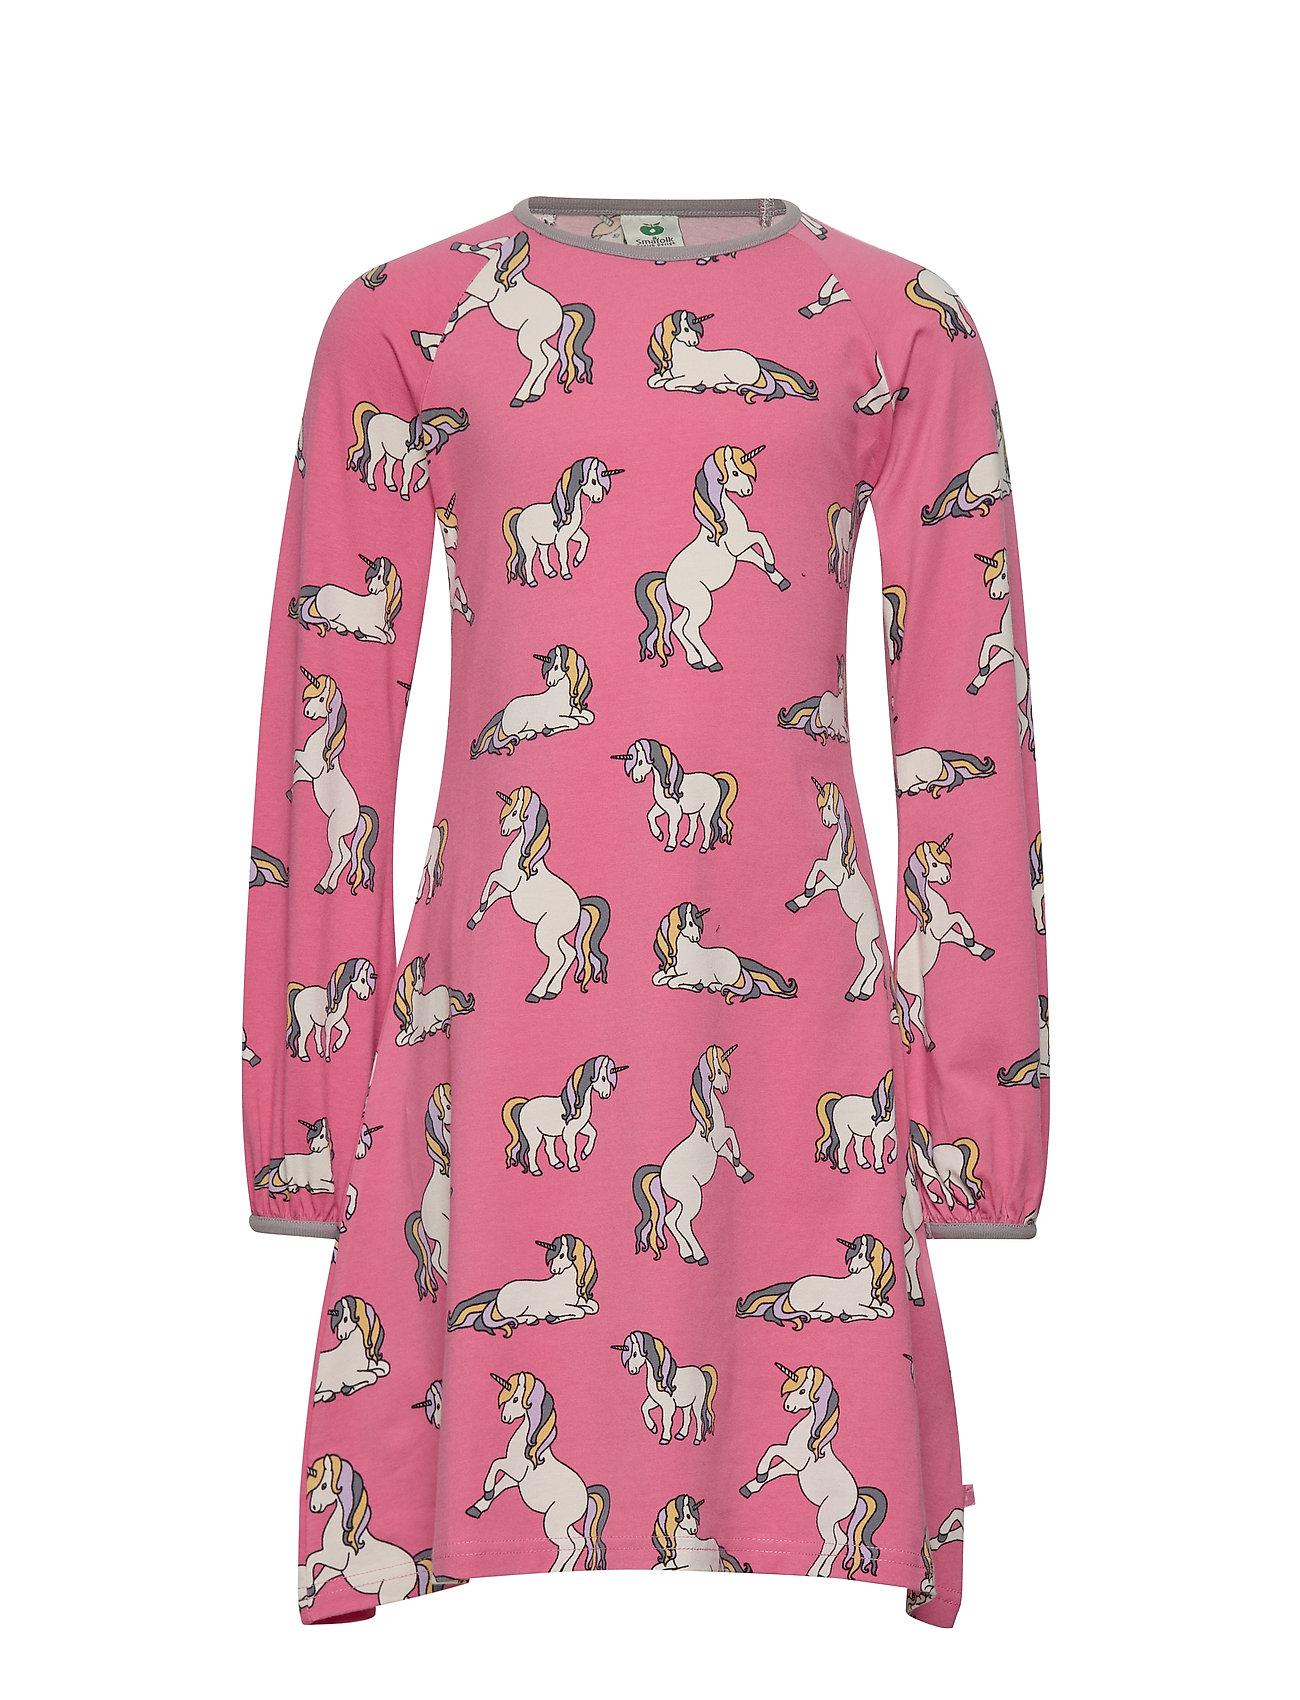 Småfolk Dress LS. Unicorn - RAPTURE ROSE